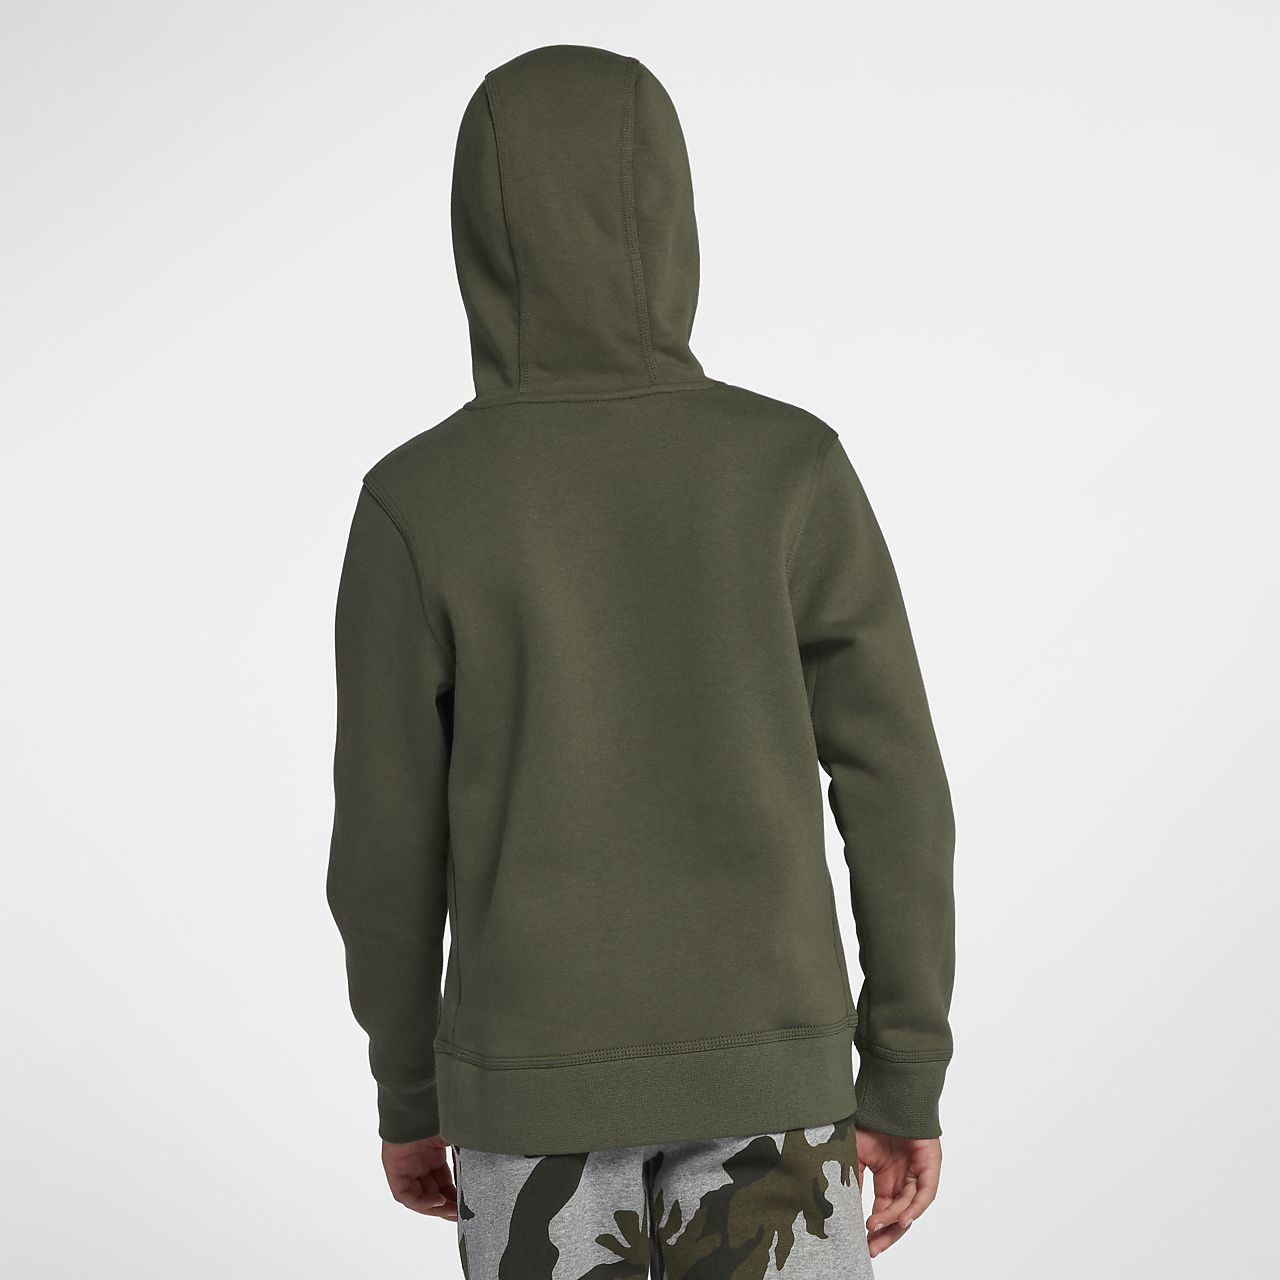 36bac8dd0d42 Παιδική μπλούζα προπόνησης με κουκούλα Nike. Nike.com GR